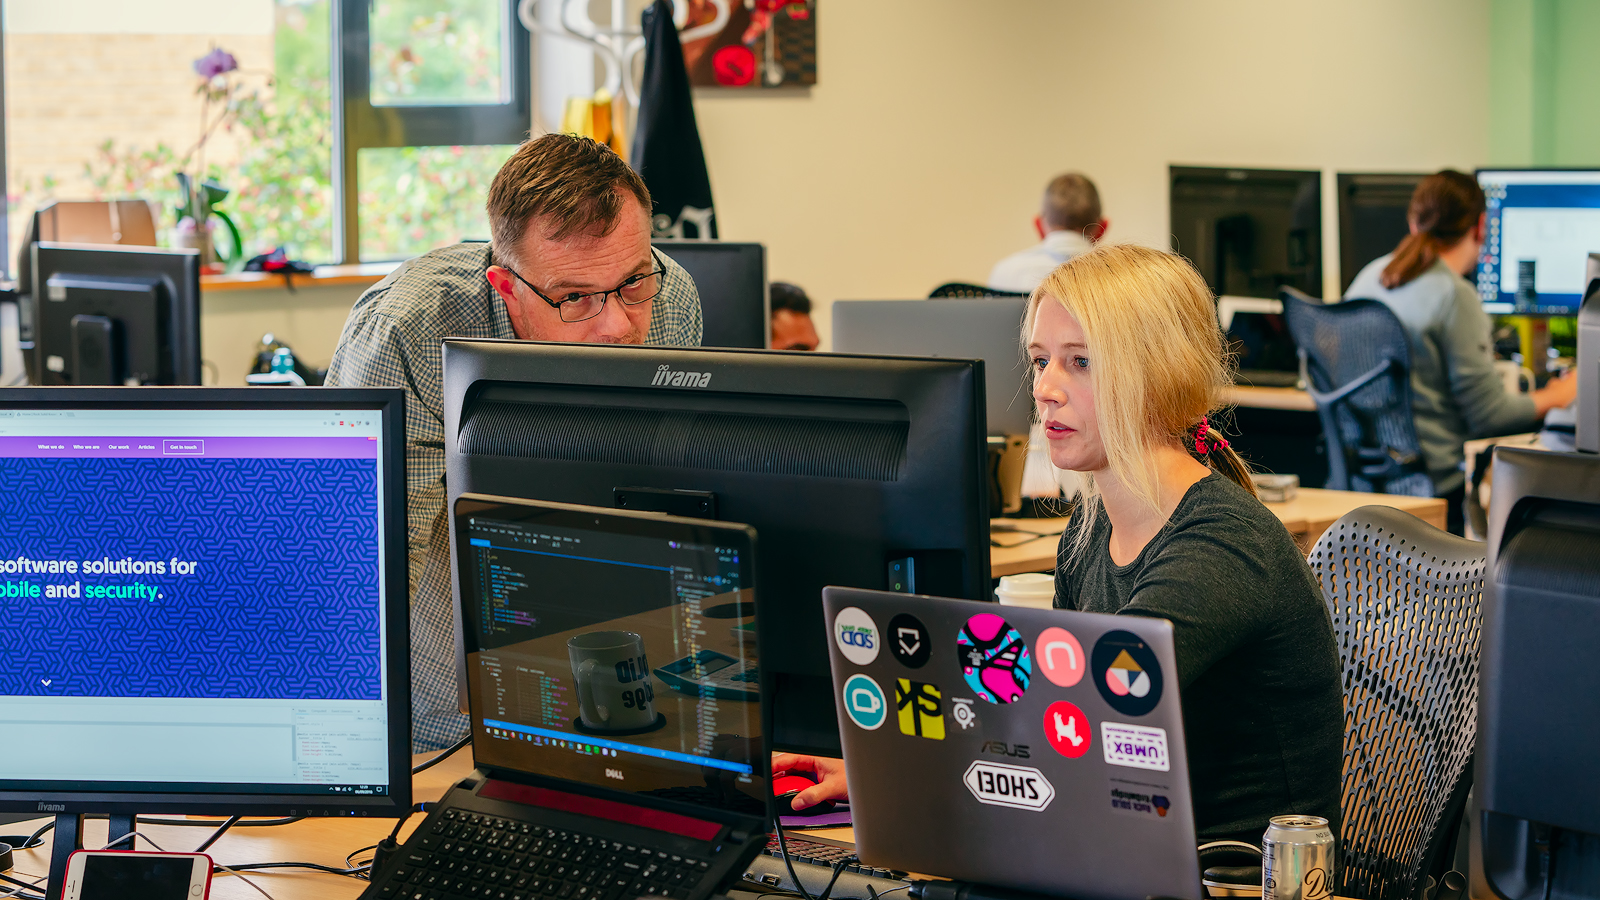 Office environment portraits 02.jpg